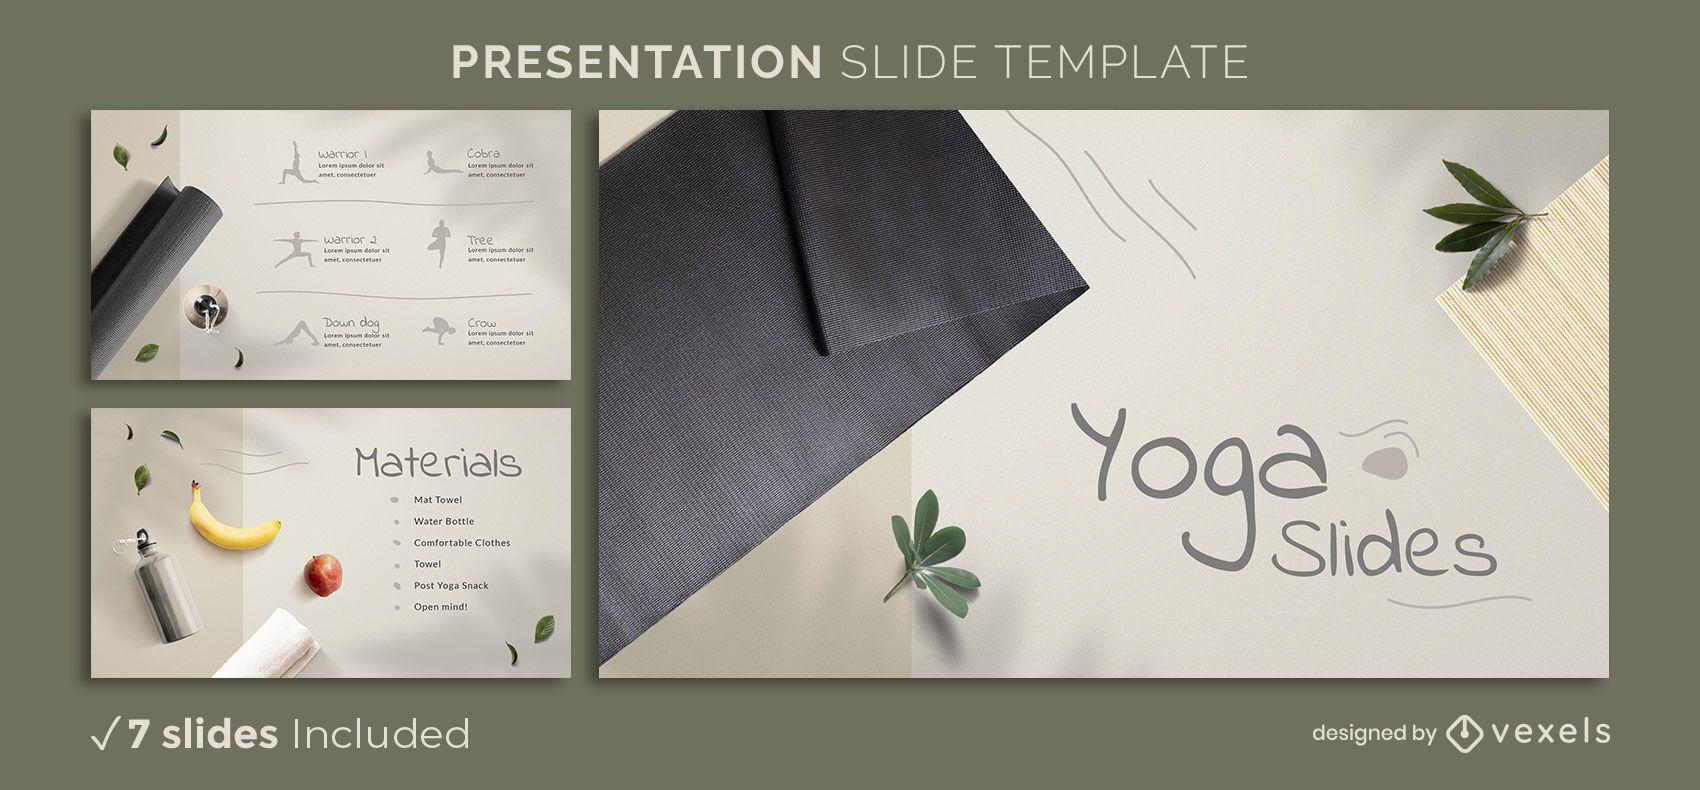 Yoga presentation template